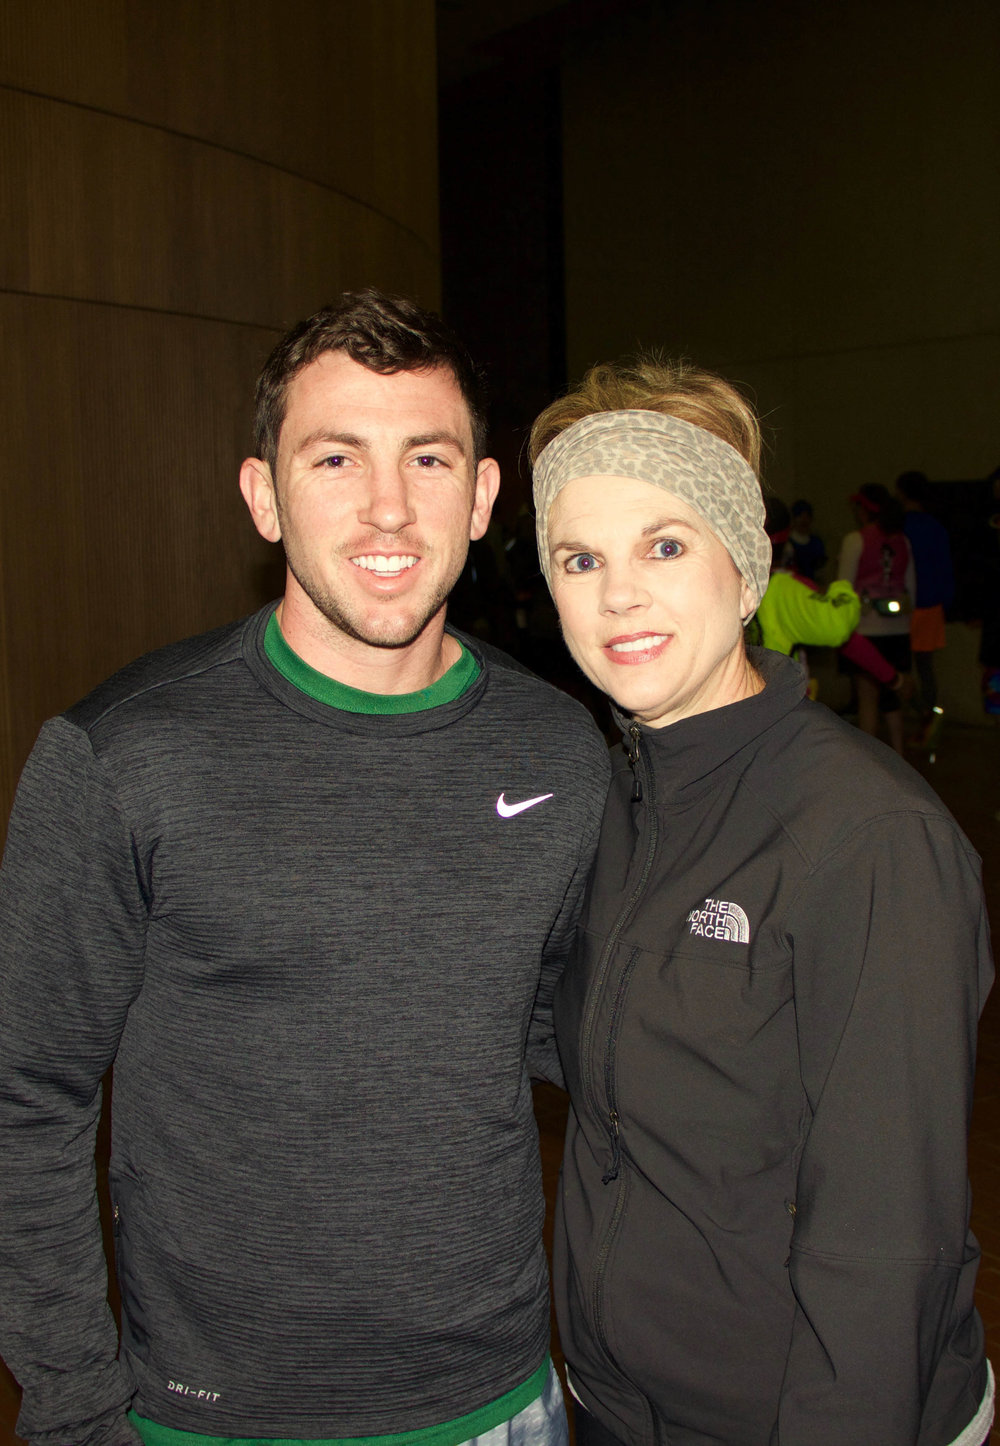 Matthew and Tammy Cochran